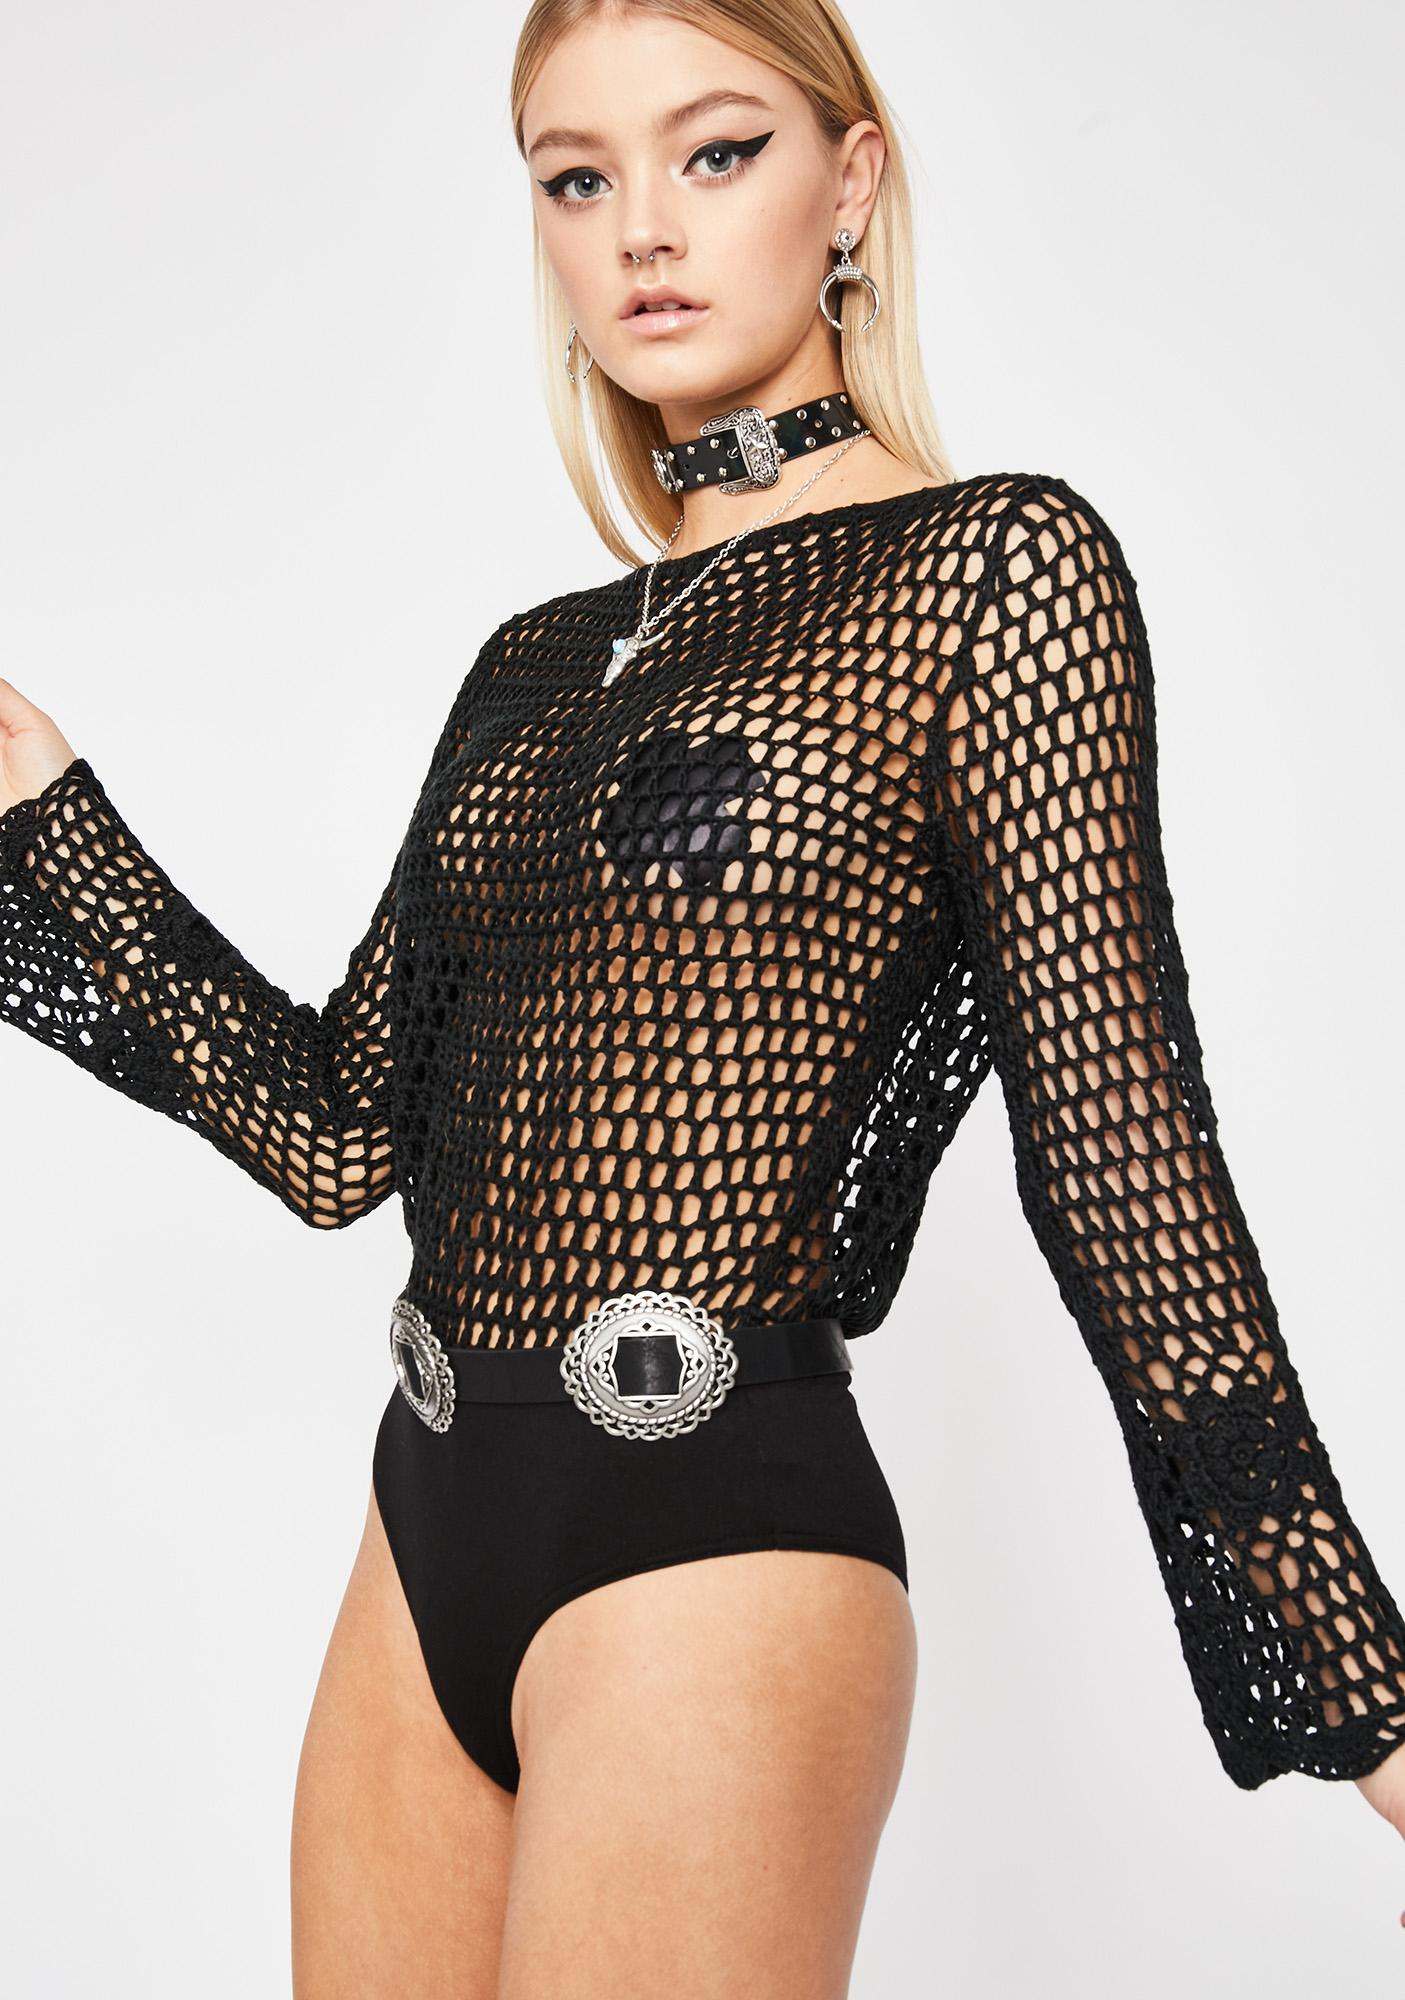 Savage Sinner Crochet Bodysuit